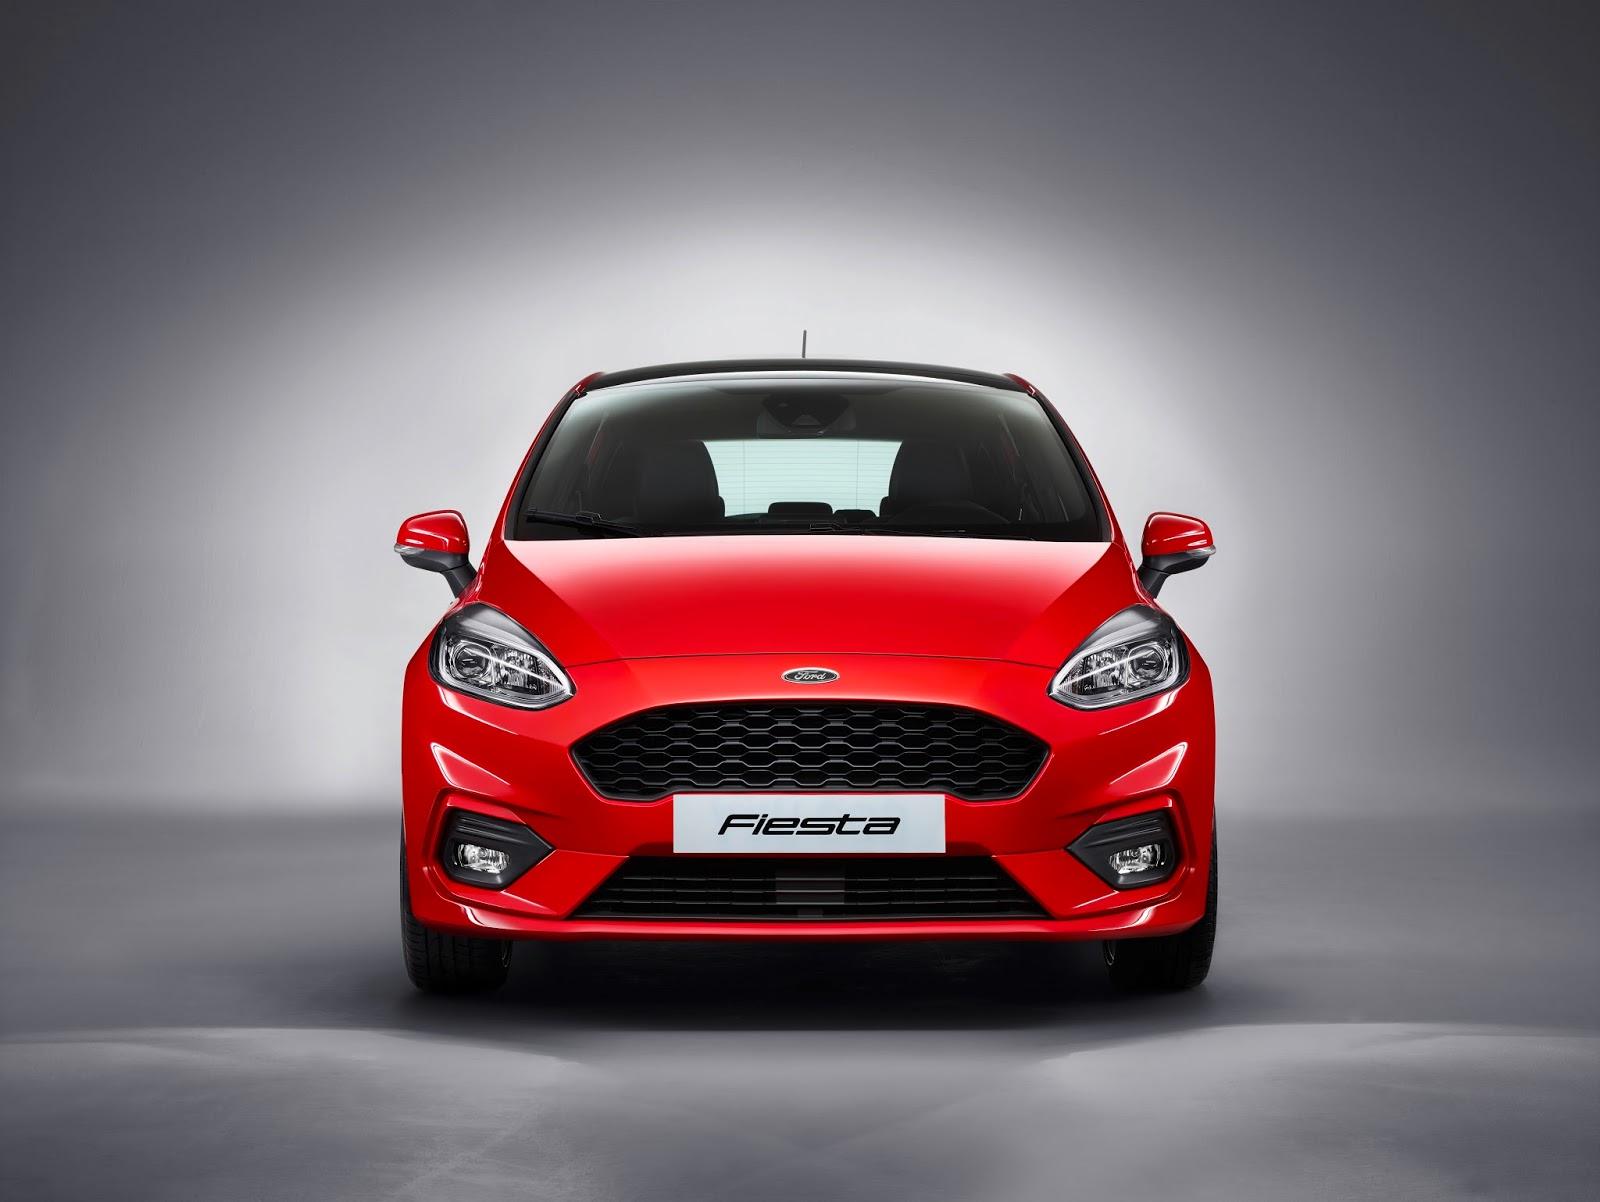 FORD FIESTA2016 ST LINE FRONT 08 Τα πρώτα Ford Fiesta έρχονται στην Ελλάδα, με τιμή από 12.990€ Bestseller, Ford, Ford Fiesta, supermini, Λανσάρισμα